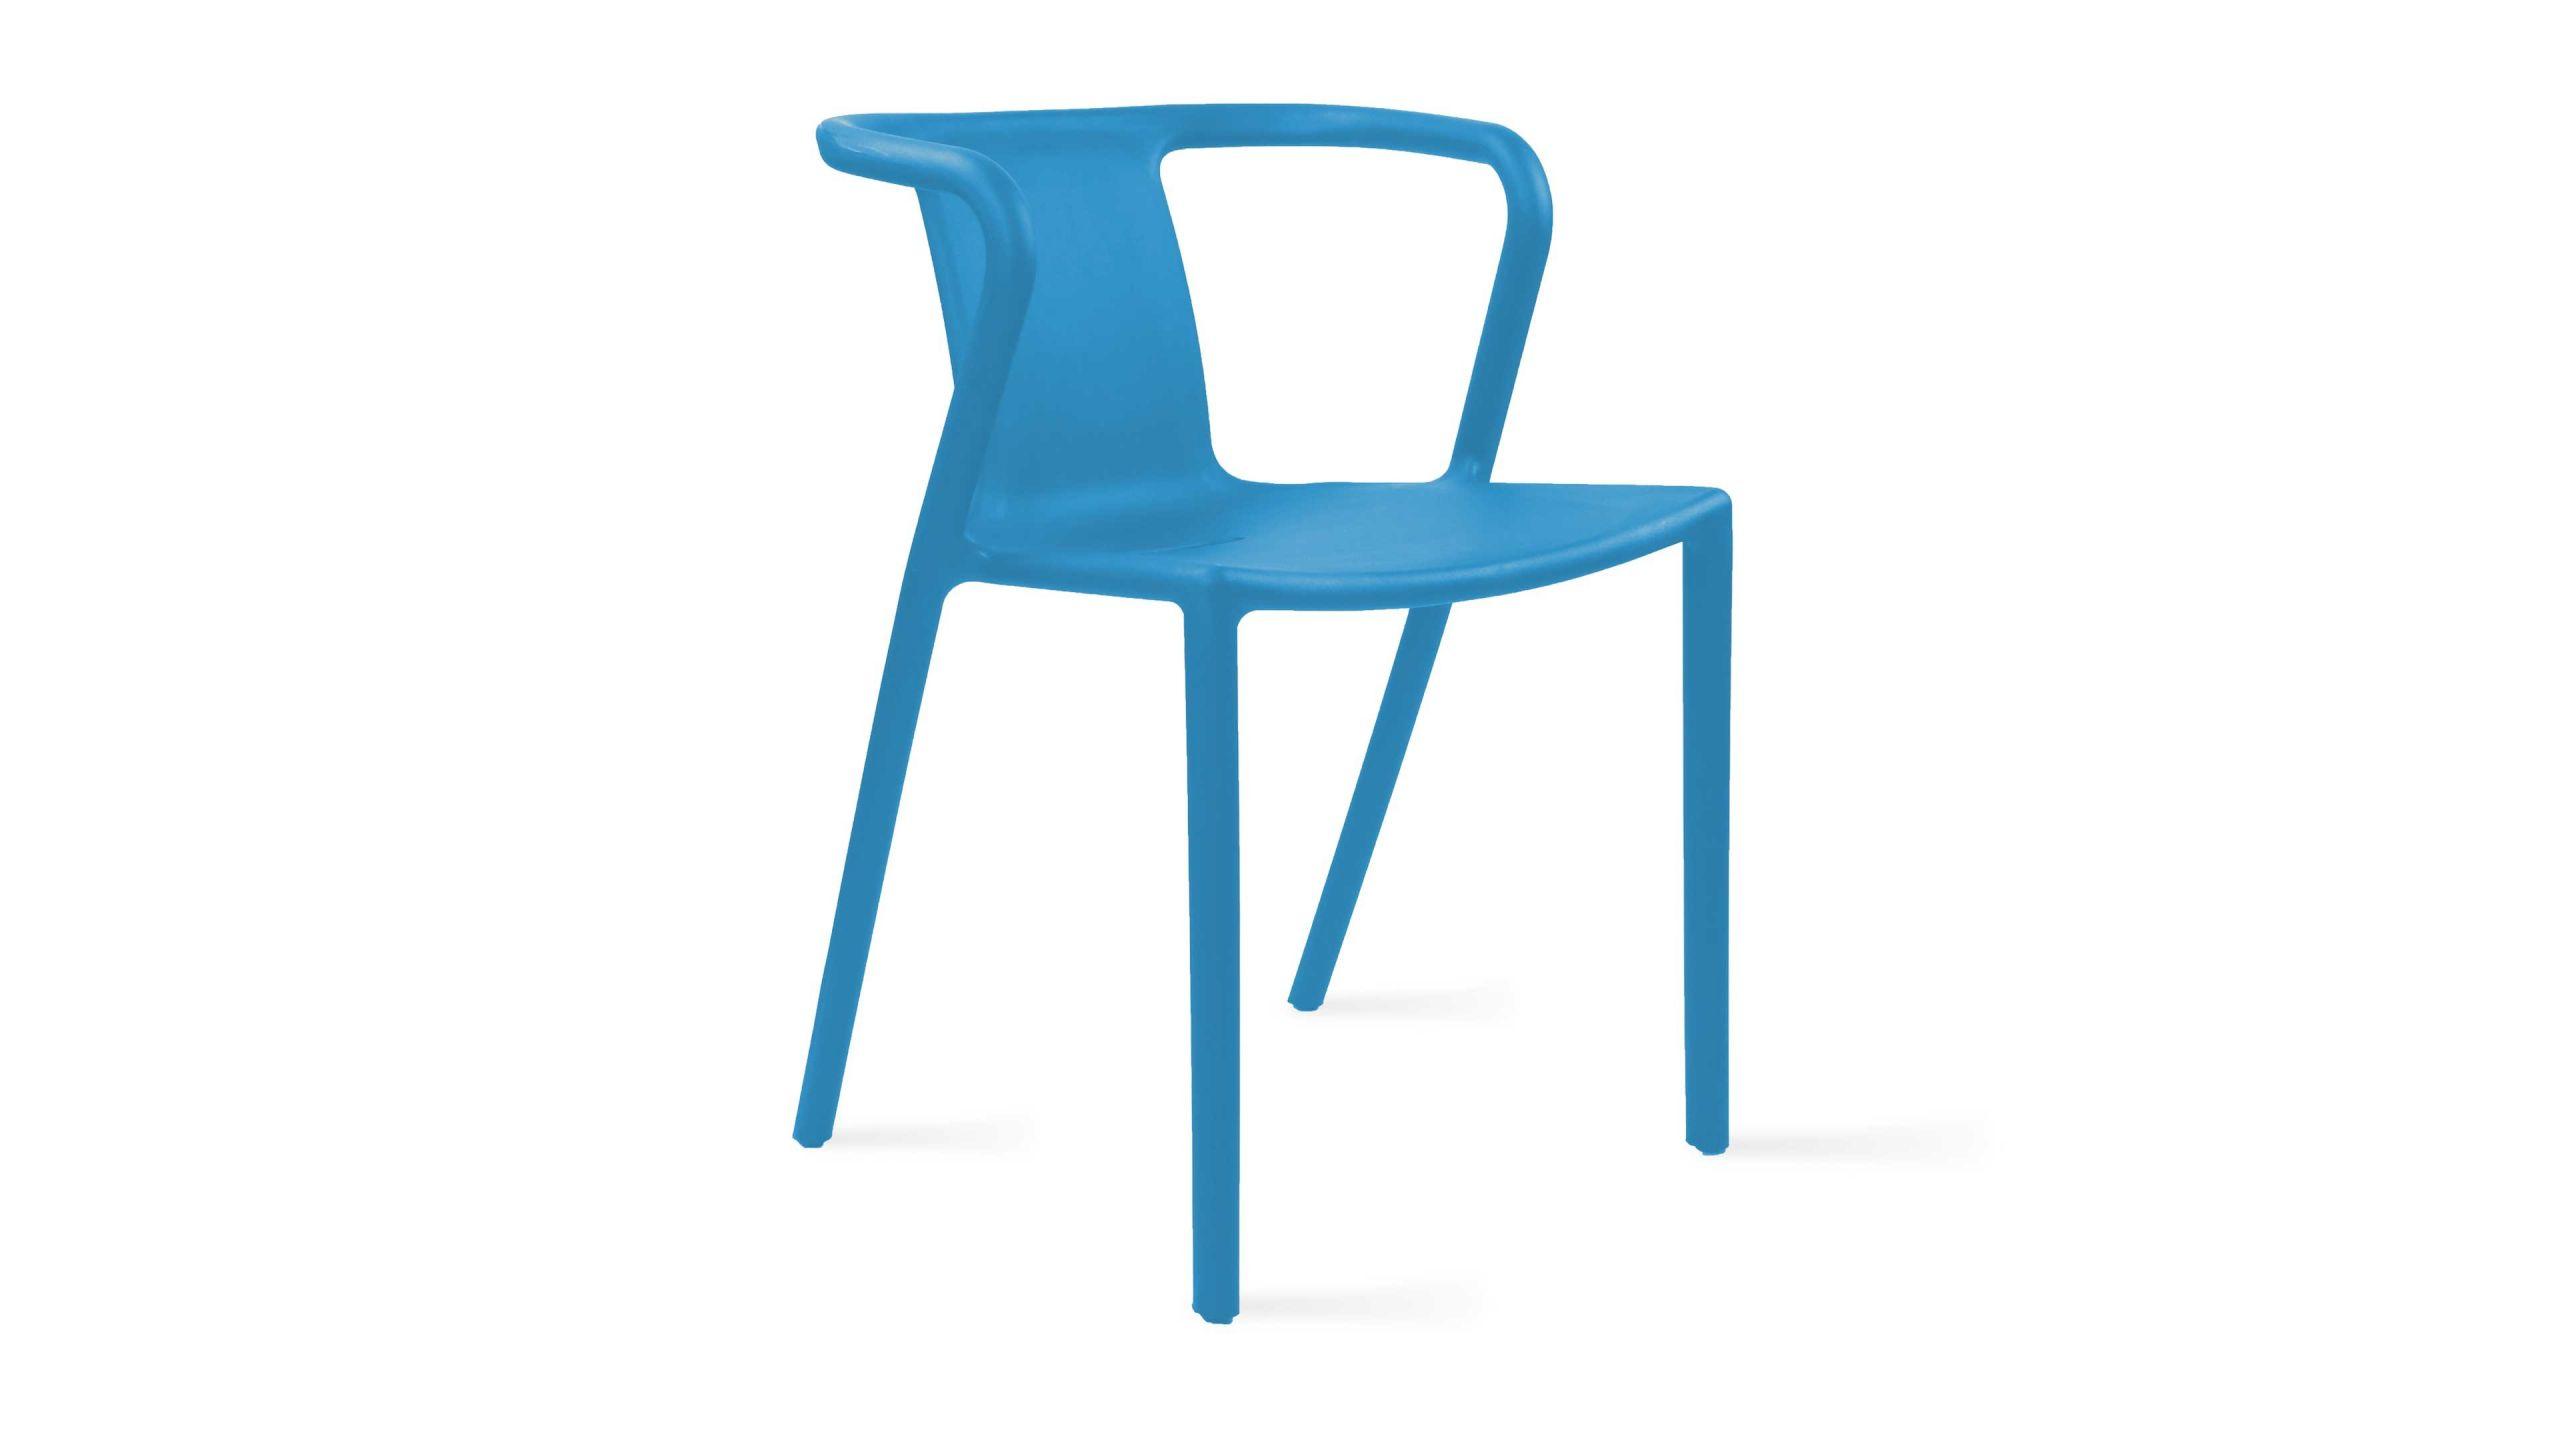 Chaise de jardin Berlin en plastique